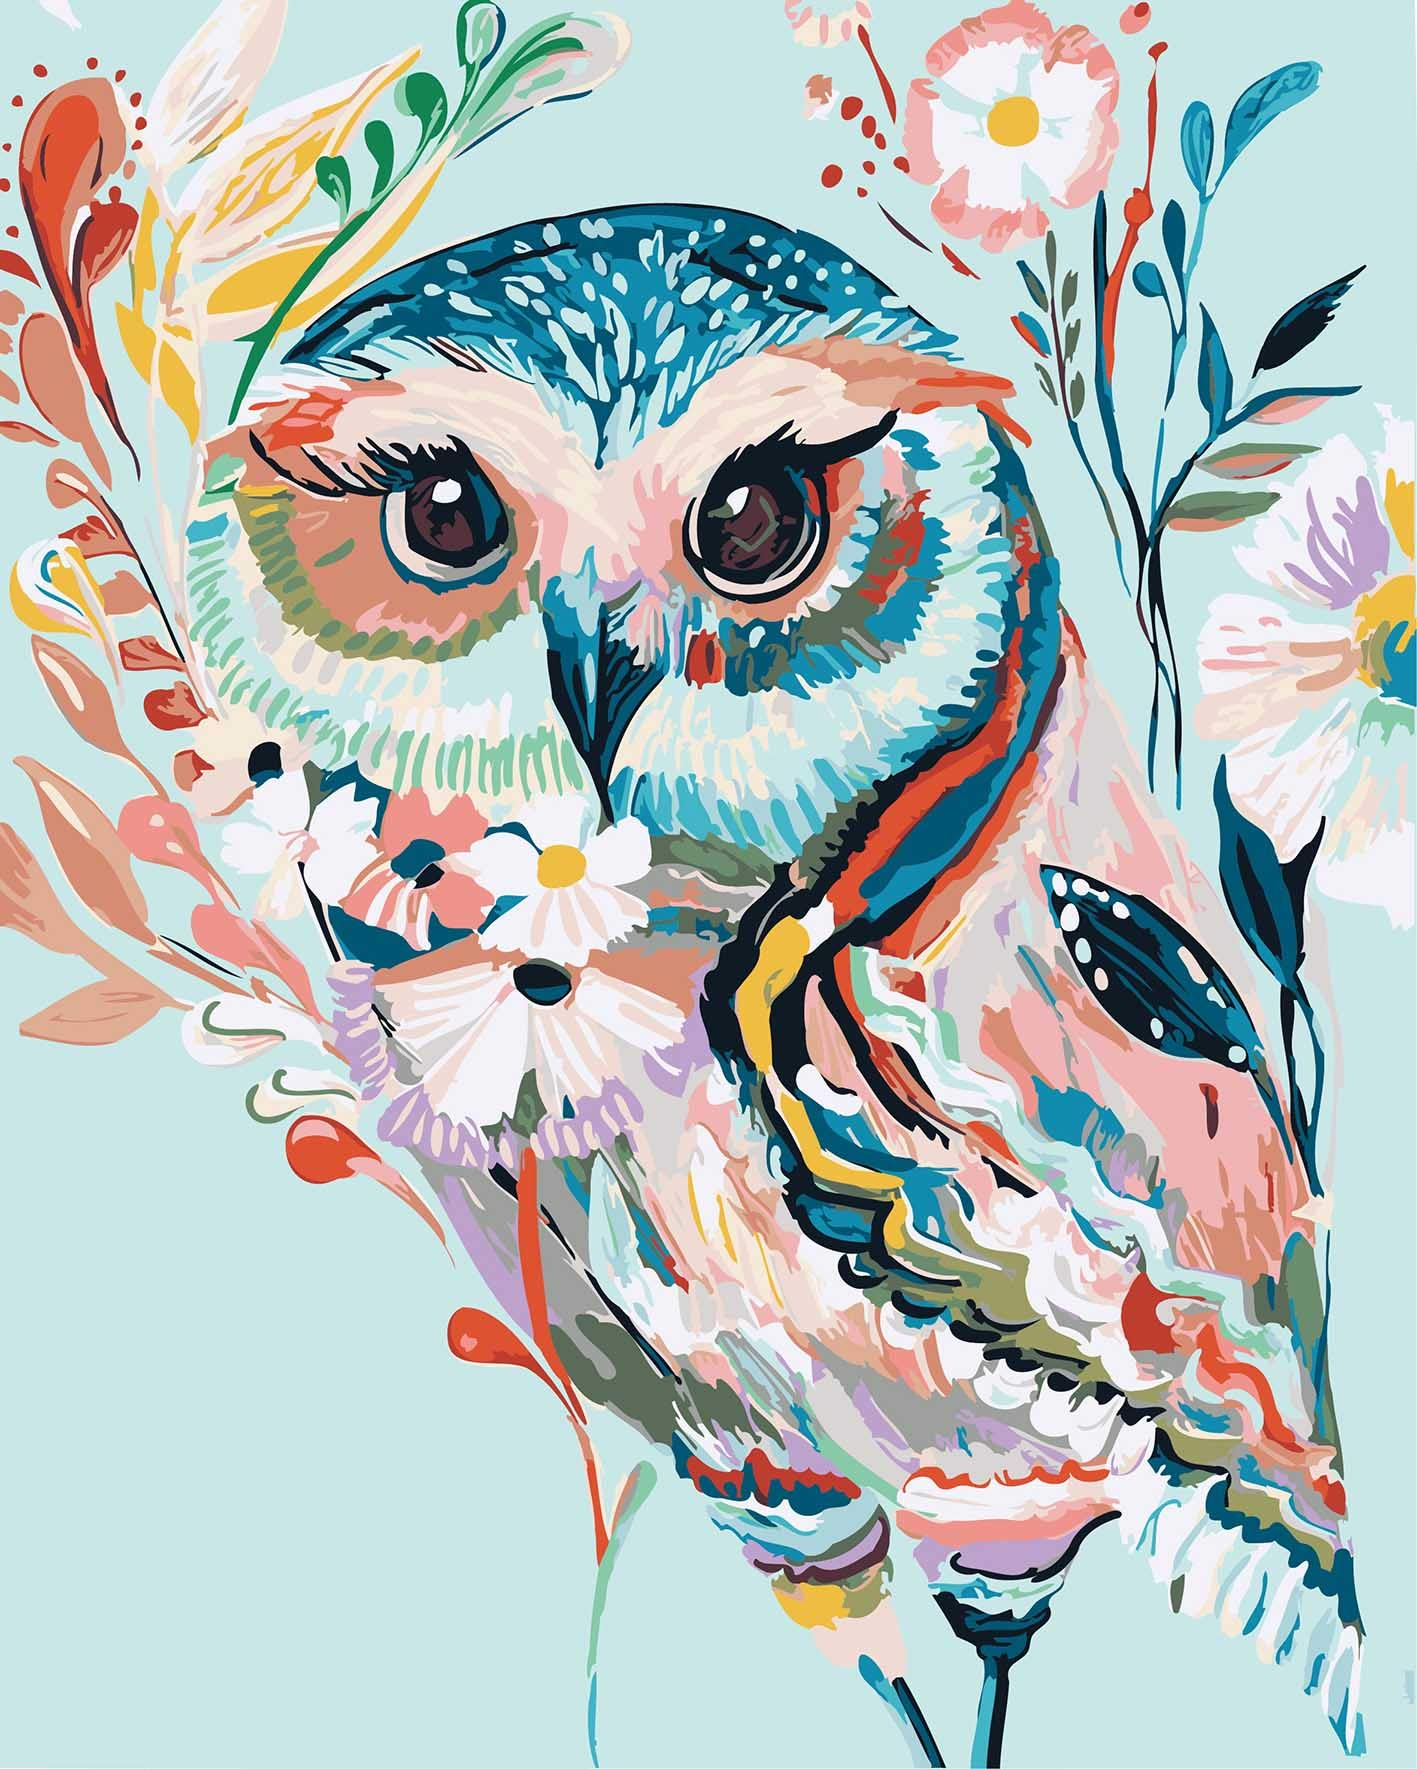 DoMyArt Acrylic Paint by Number Kit On Canvas for Adults Beginner - Rainbow Owl 16X20 Inch by DoMyArt